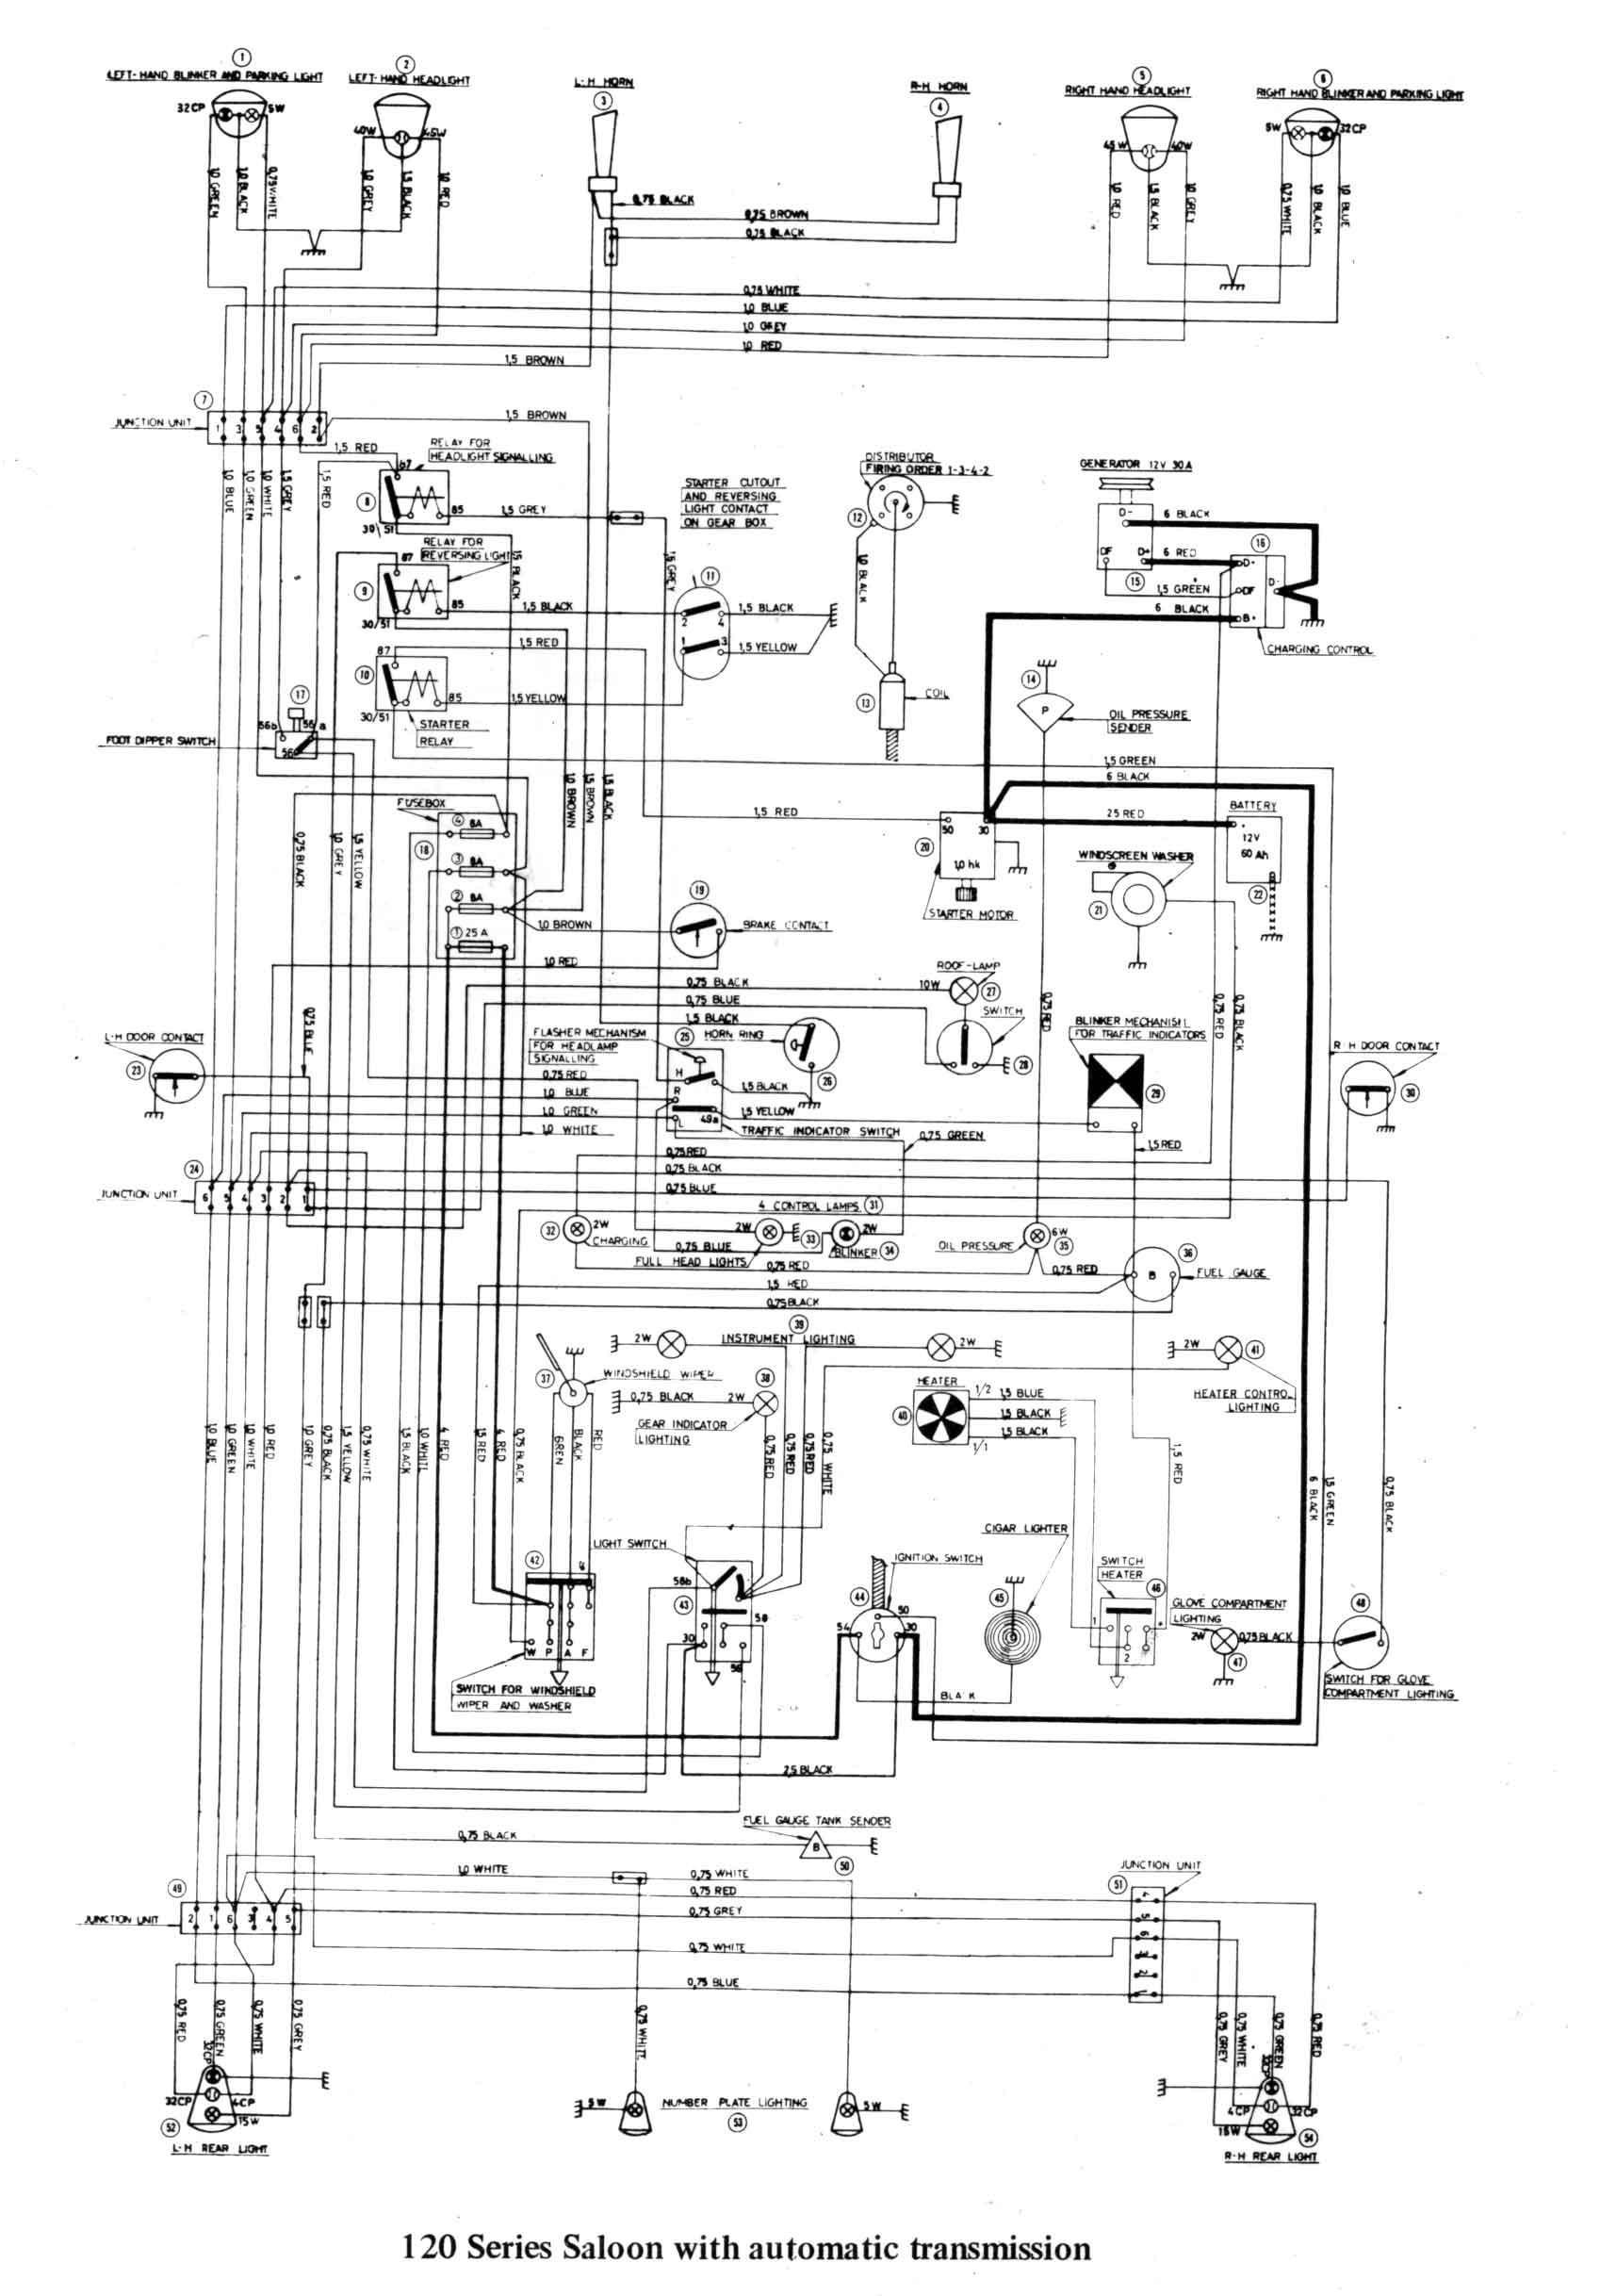 hight resolution of mitsubishi eclipse engine diagram vw 2 0 engine diagram automatic transmission schematic diagram sw em of